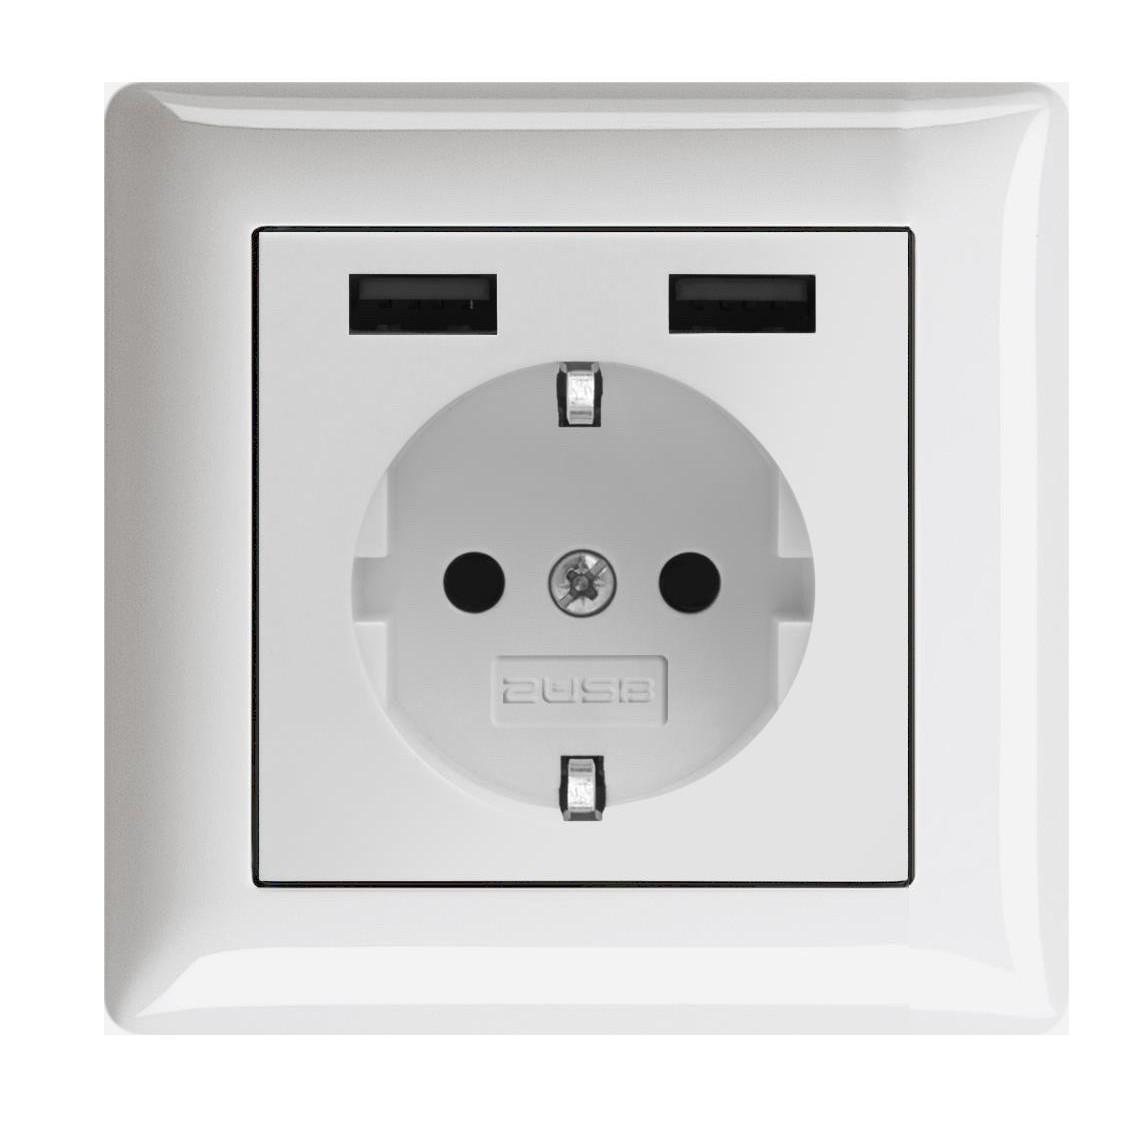 Die USB Steckdose für Gira, Jung, Berker uvm. | Elektricworld24.de